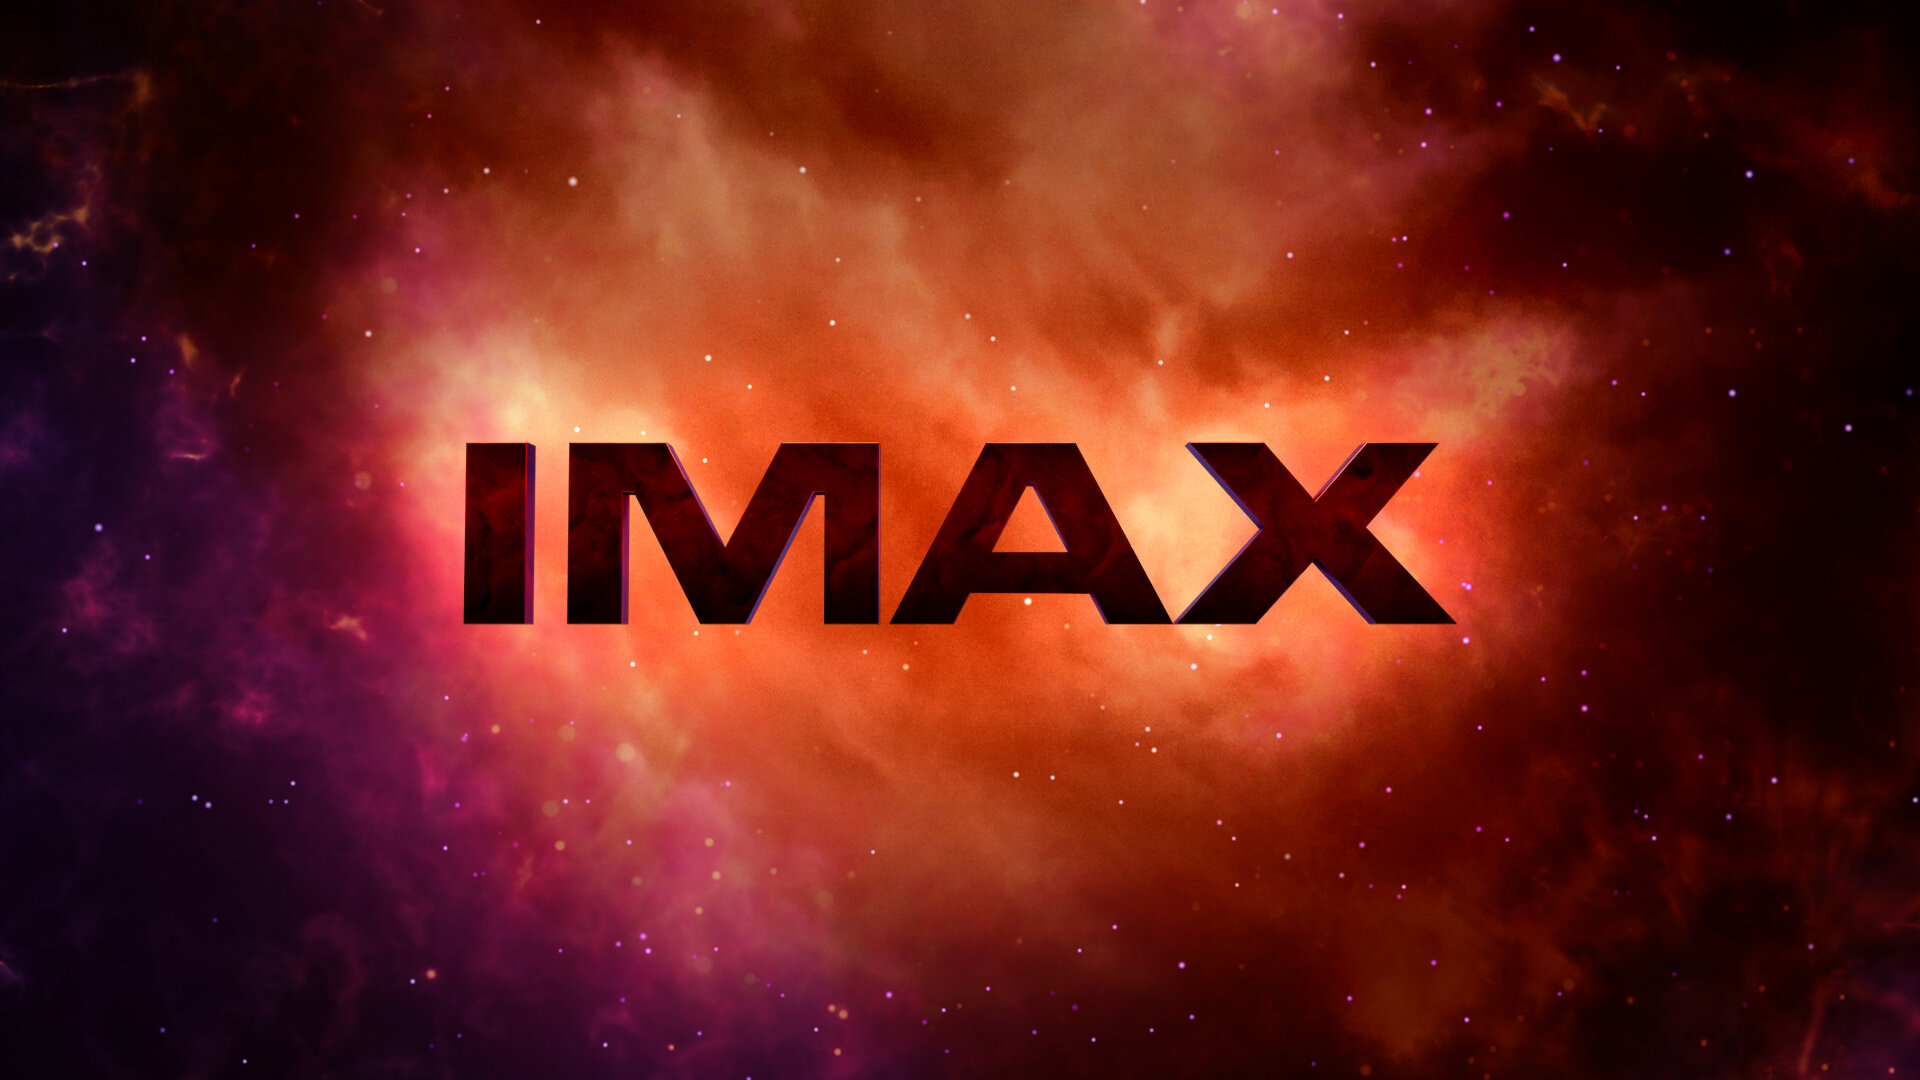 IMAX_DP_BL_03_01.jpg